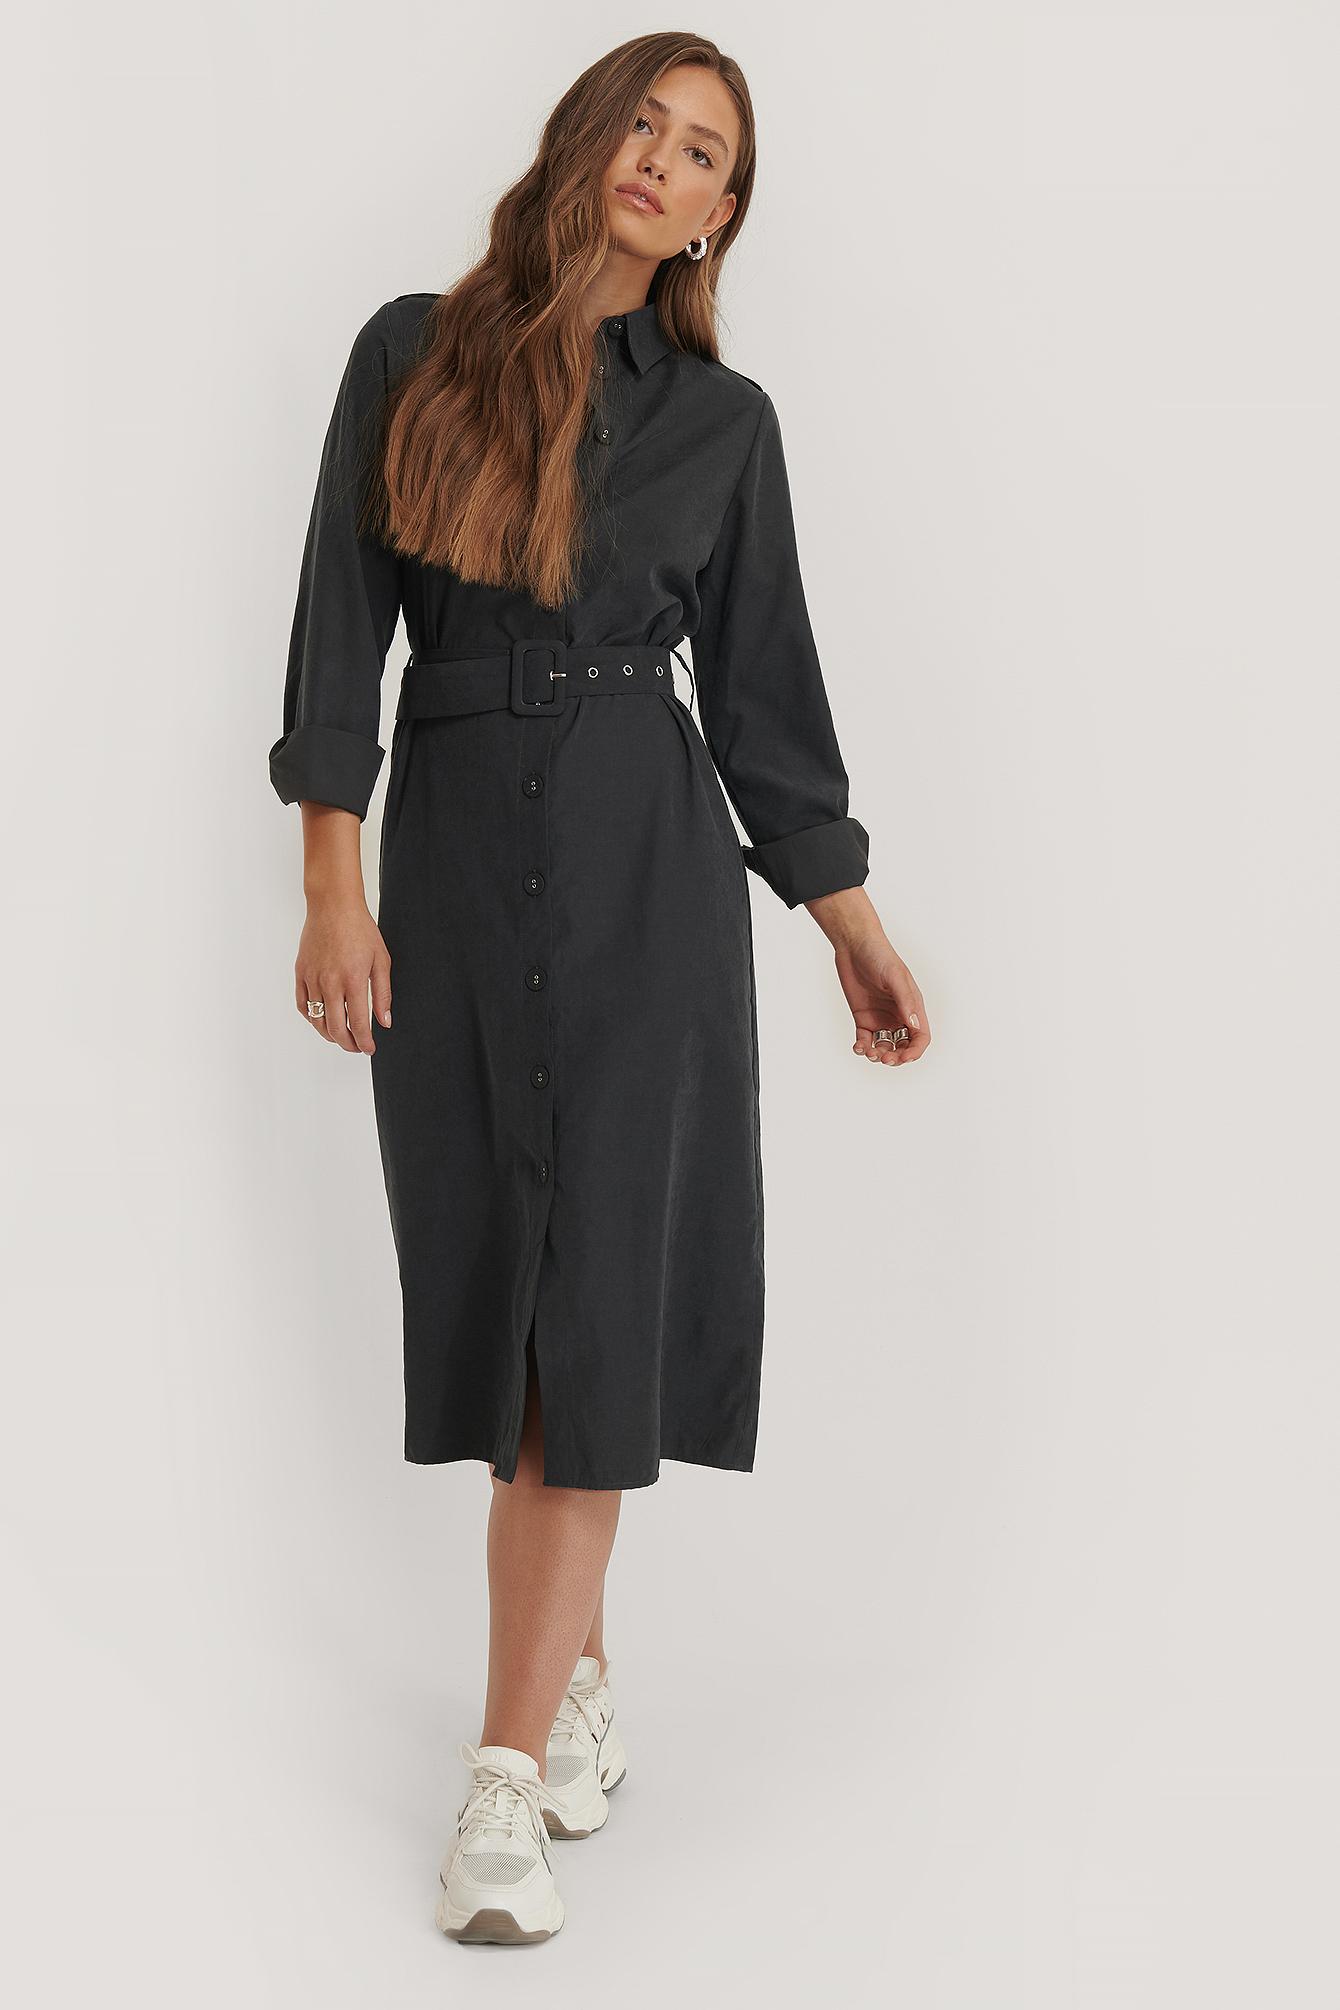 NA-KD Hemdkleid Mit Gürtel - Black | Bekleidung > Kleider > Blusenkleider | NA-KD